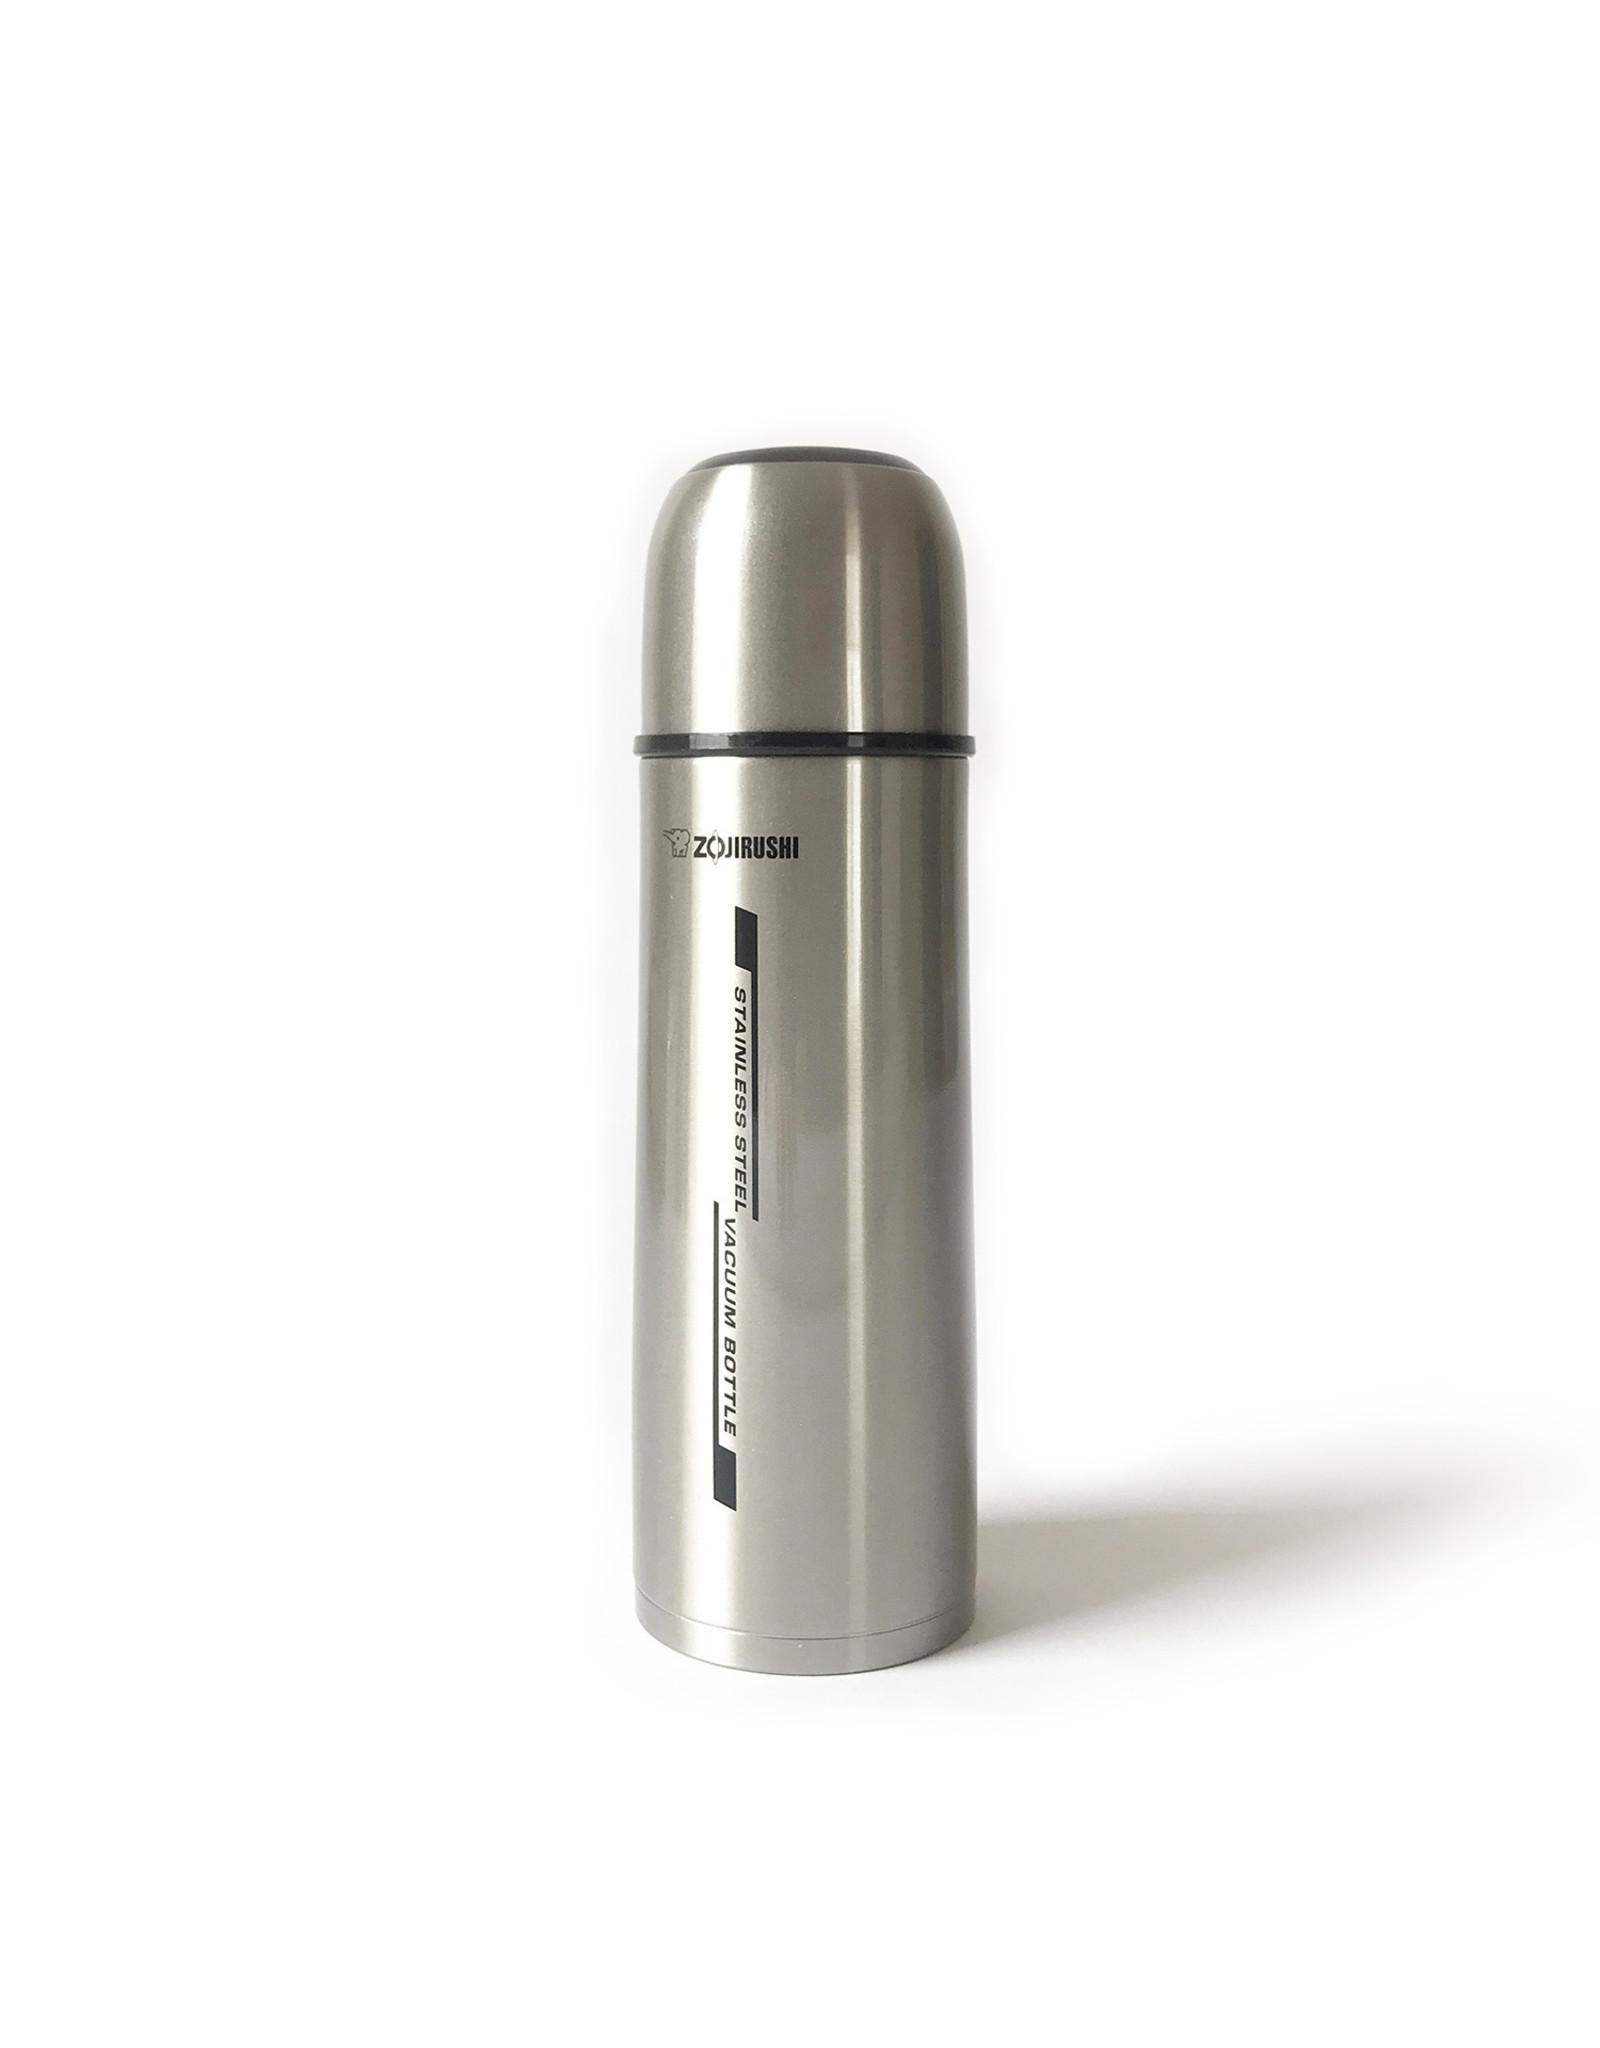 Zojirushi Zojirushi Vacuum Bottle in Stainless Steel, 17 oz.